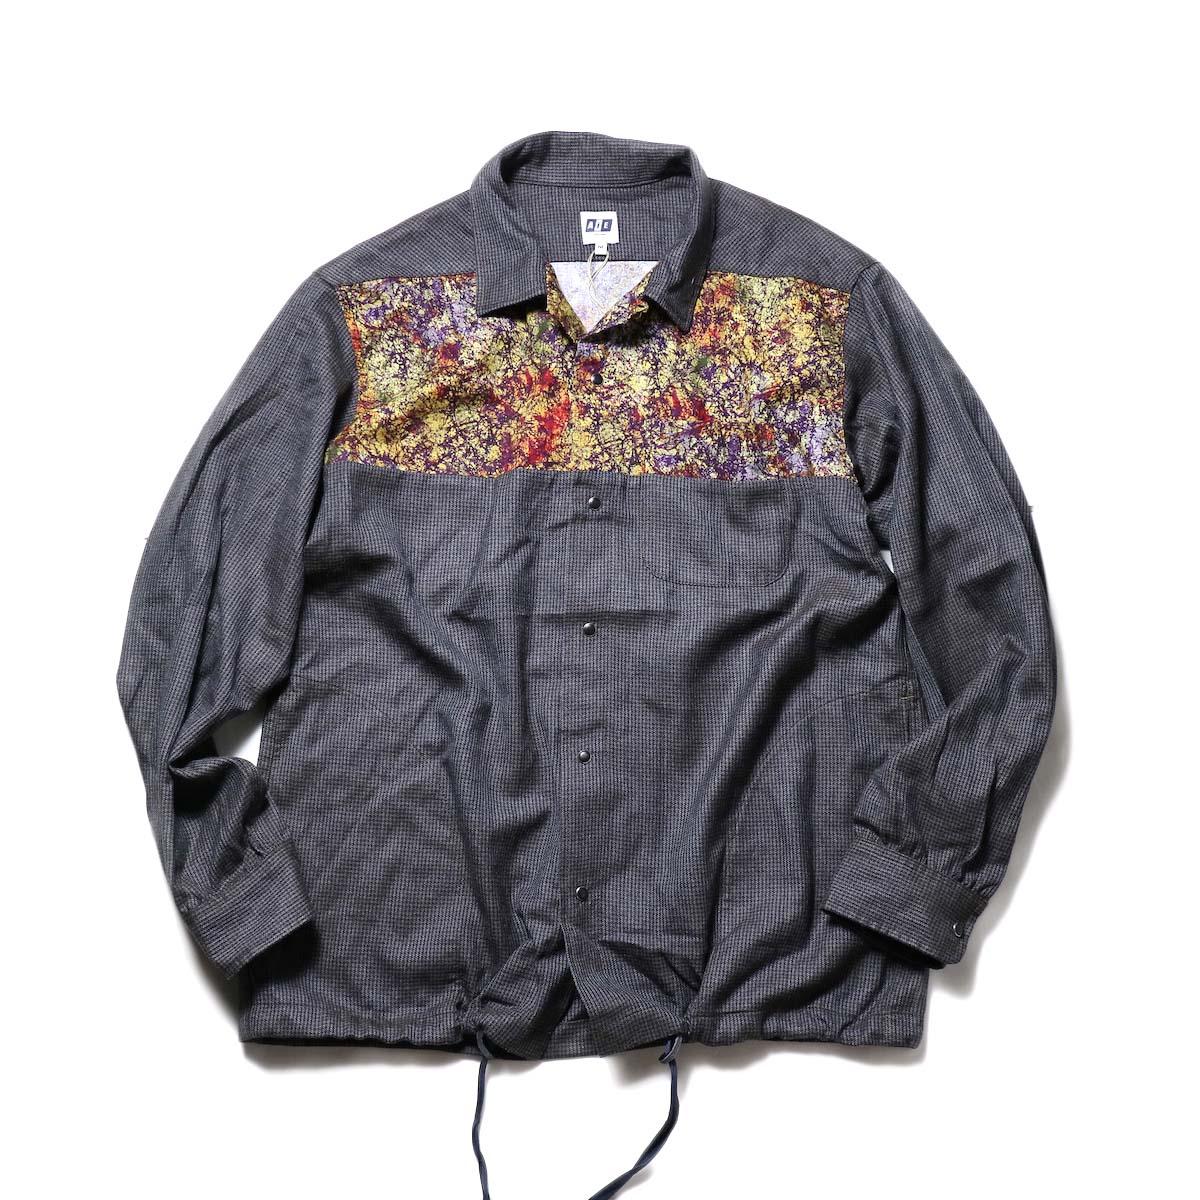 AiE / Coach Shirt -Wool Check (Charcoal)